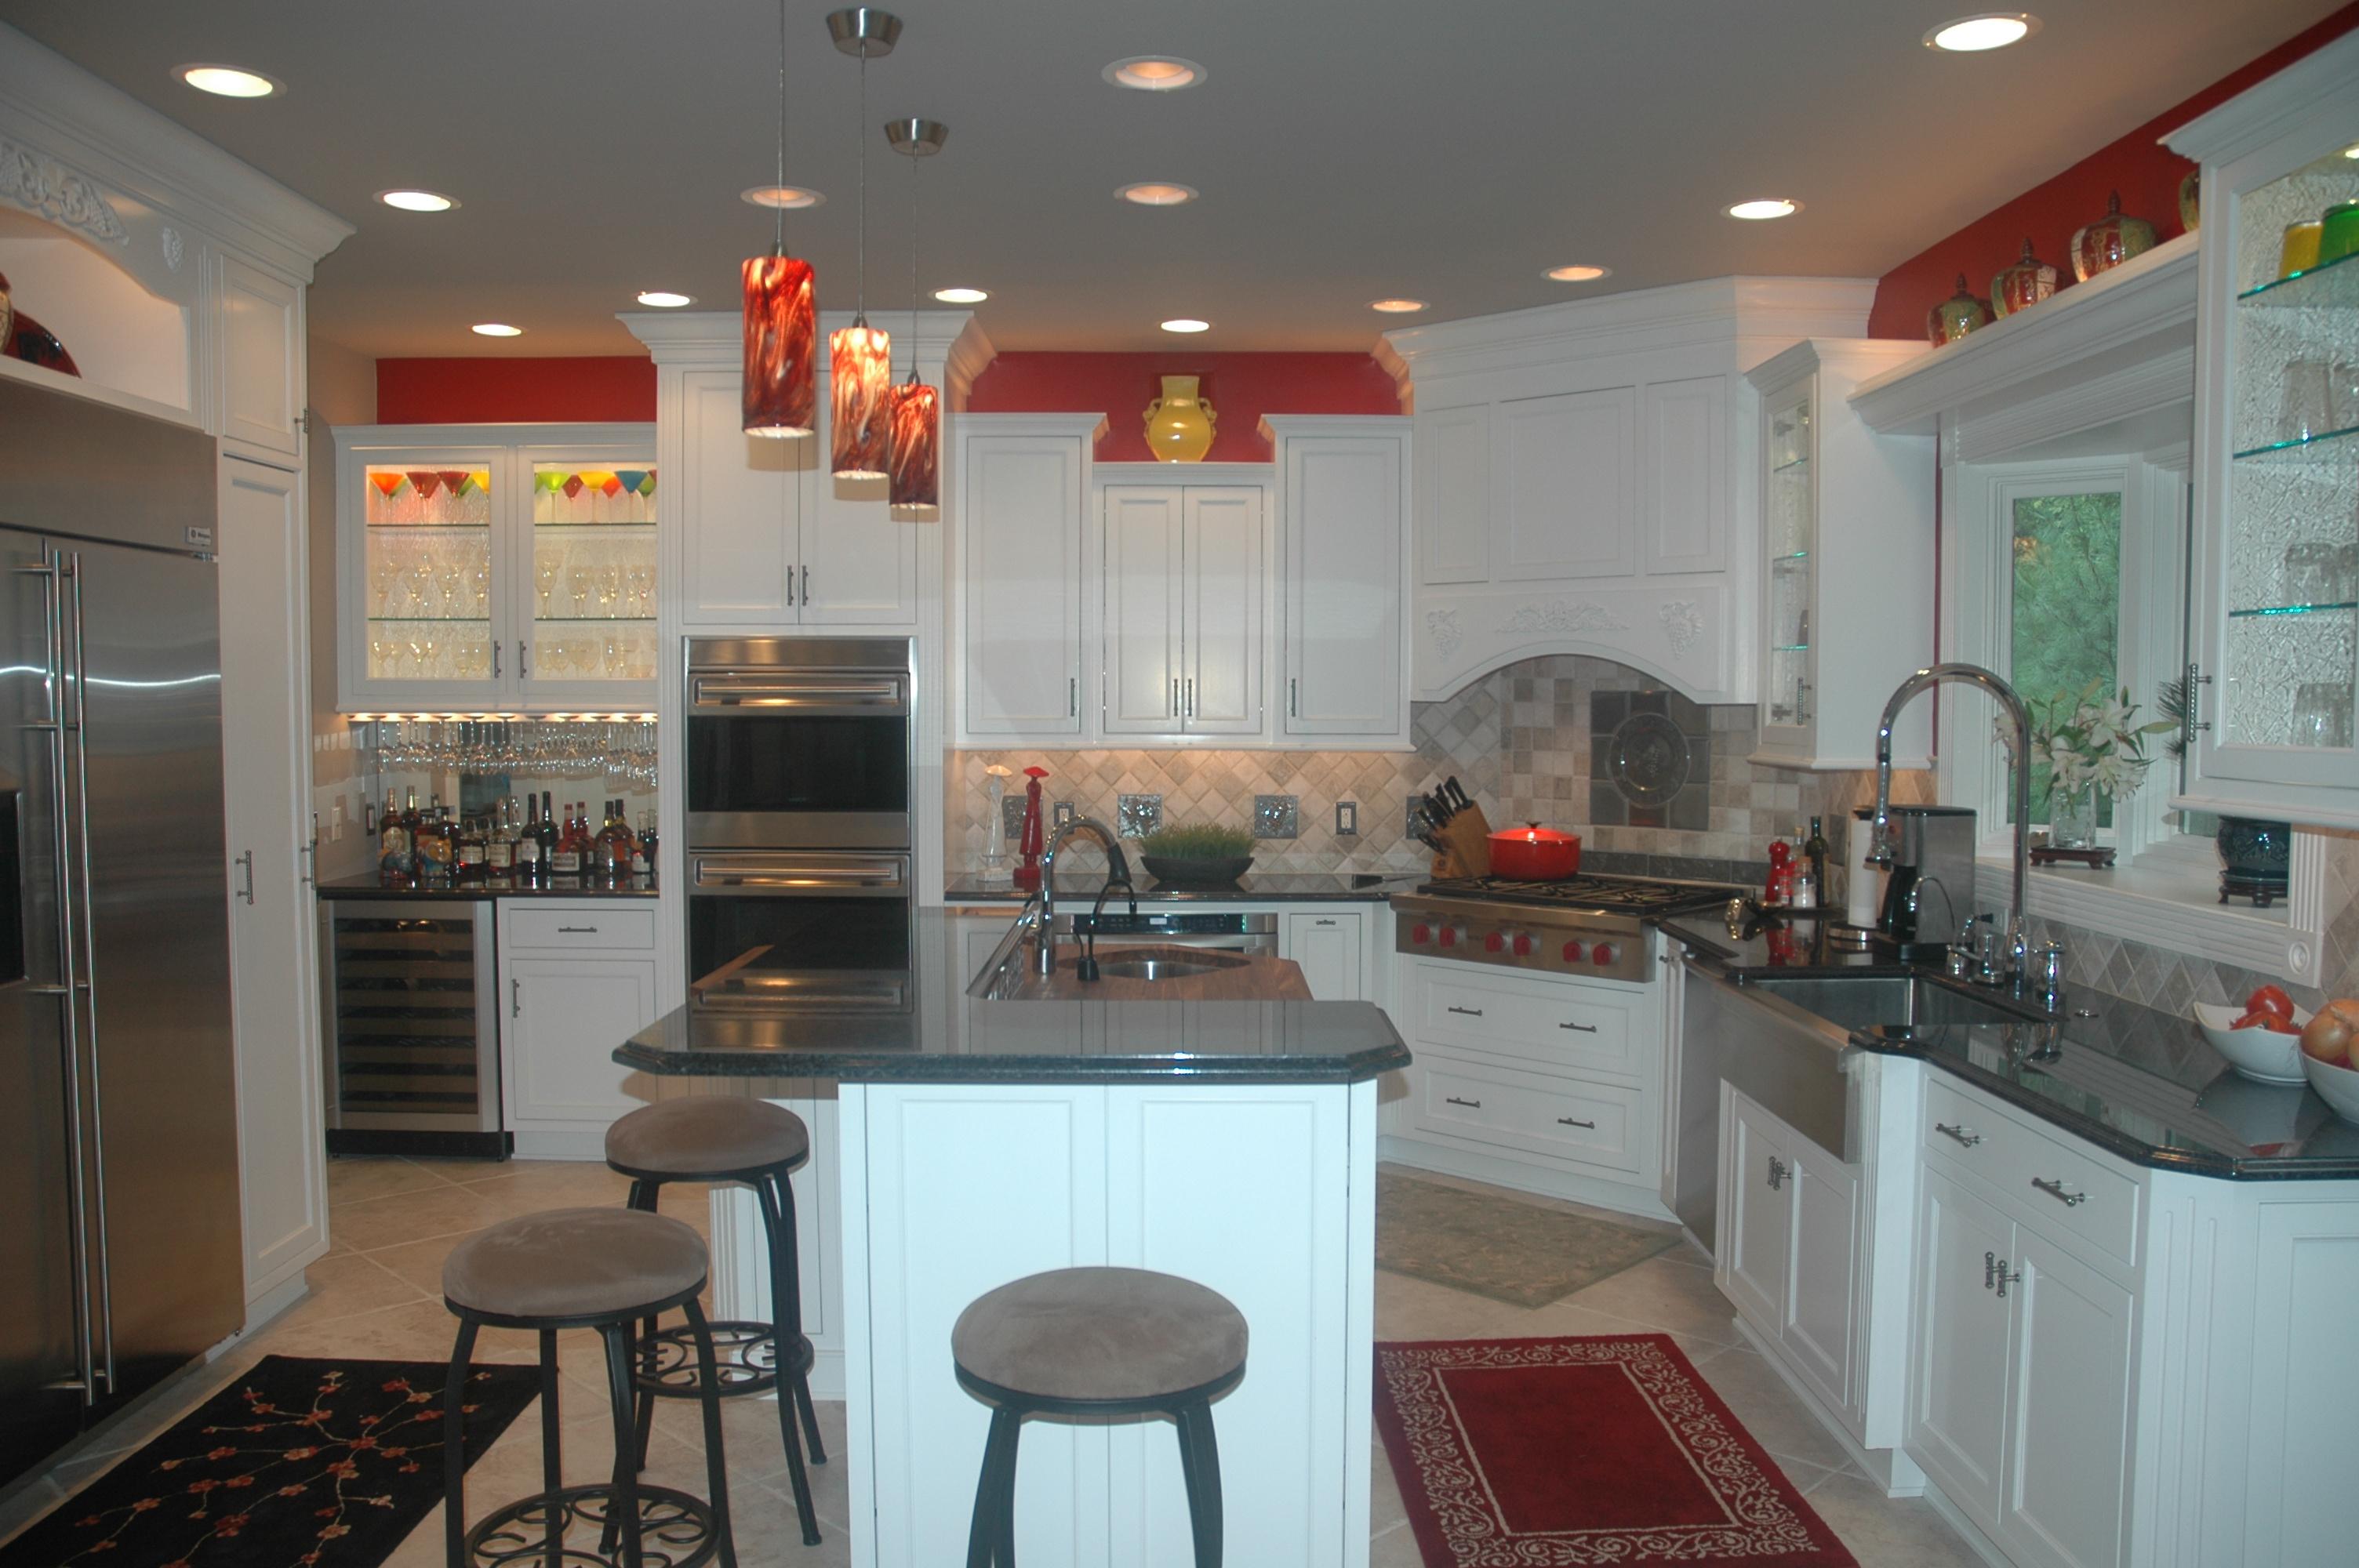 Kitchens Etc Inc in Scotch Plains NJ 732 752 7